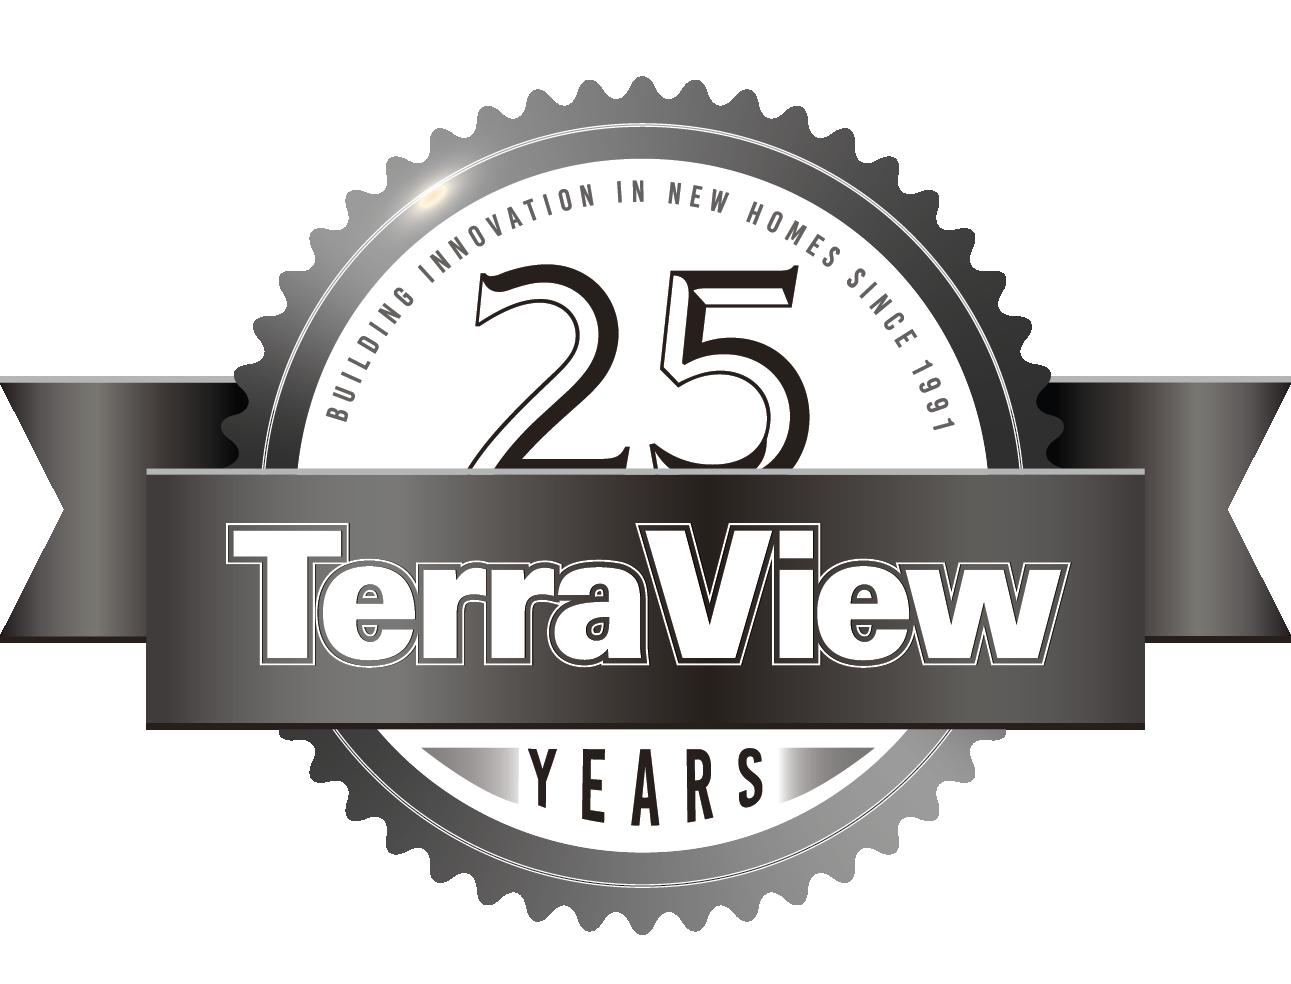 Terra View Homes